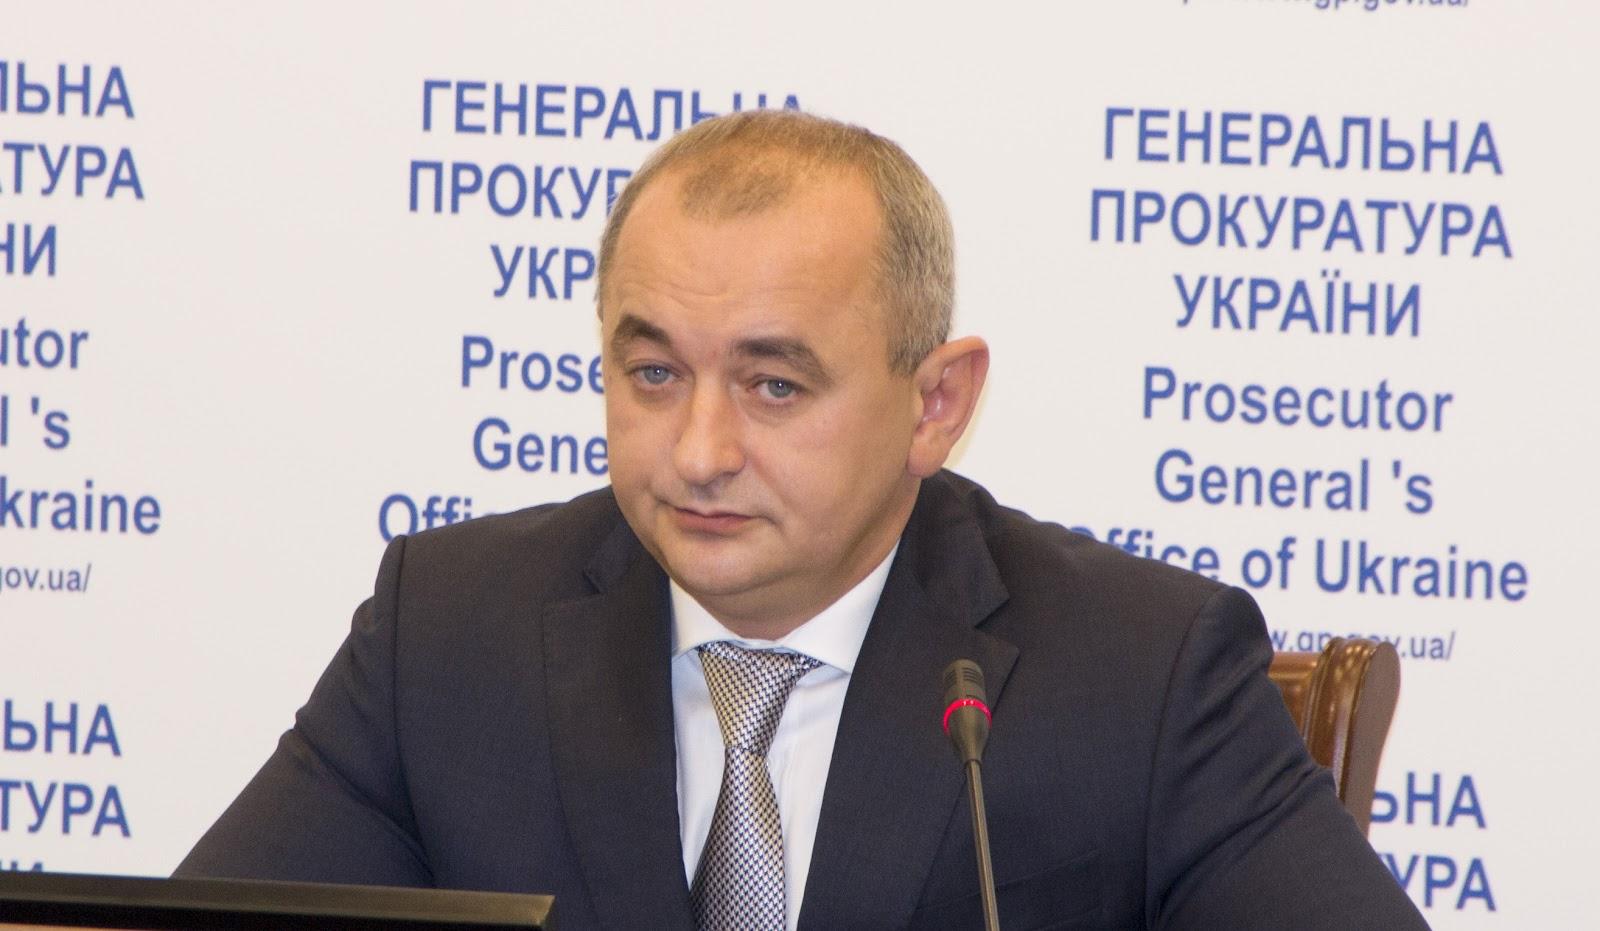 Анатолий Матиос. Фото: пресс-служба Генпрокуратуры